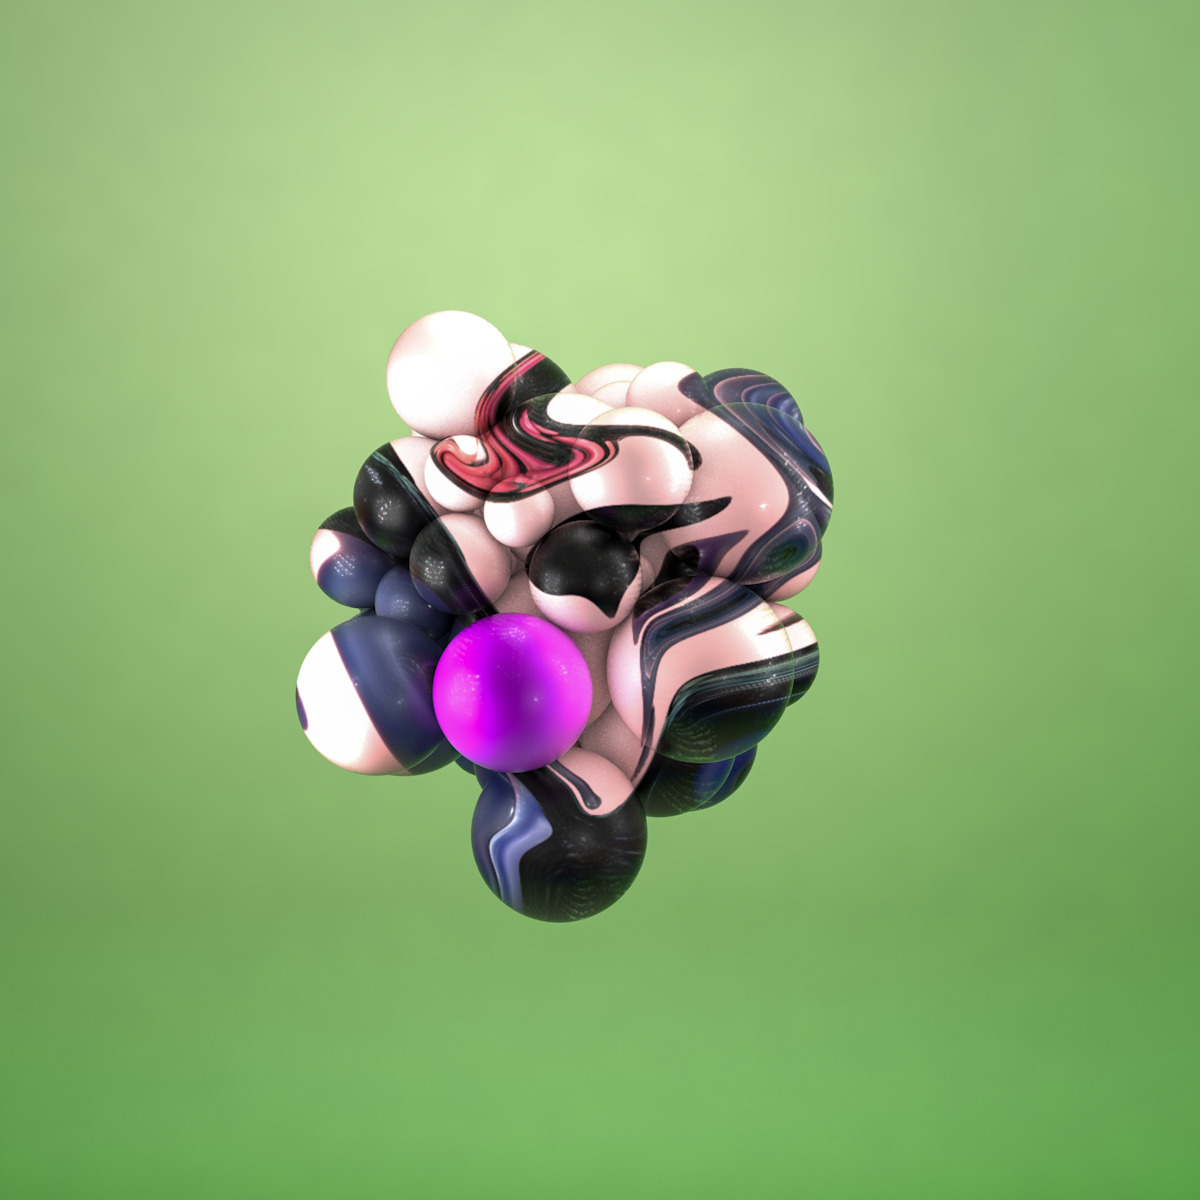 dead rest, sad - 3D, Design, Colorful - sebastianfuentez | ello